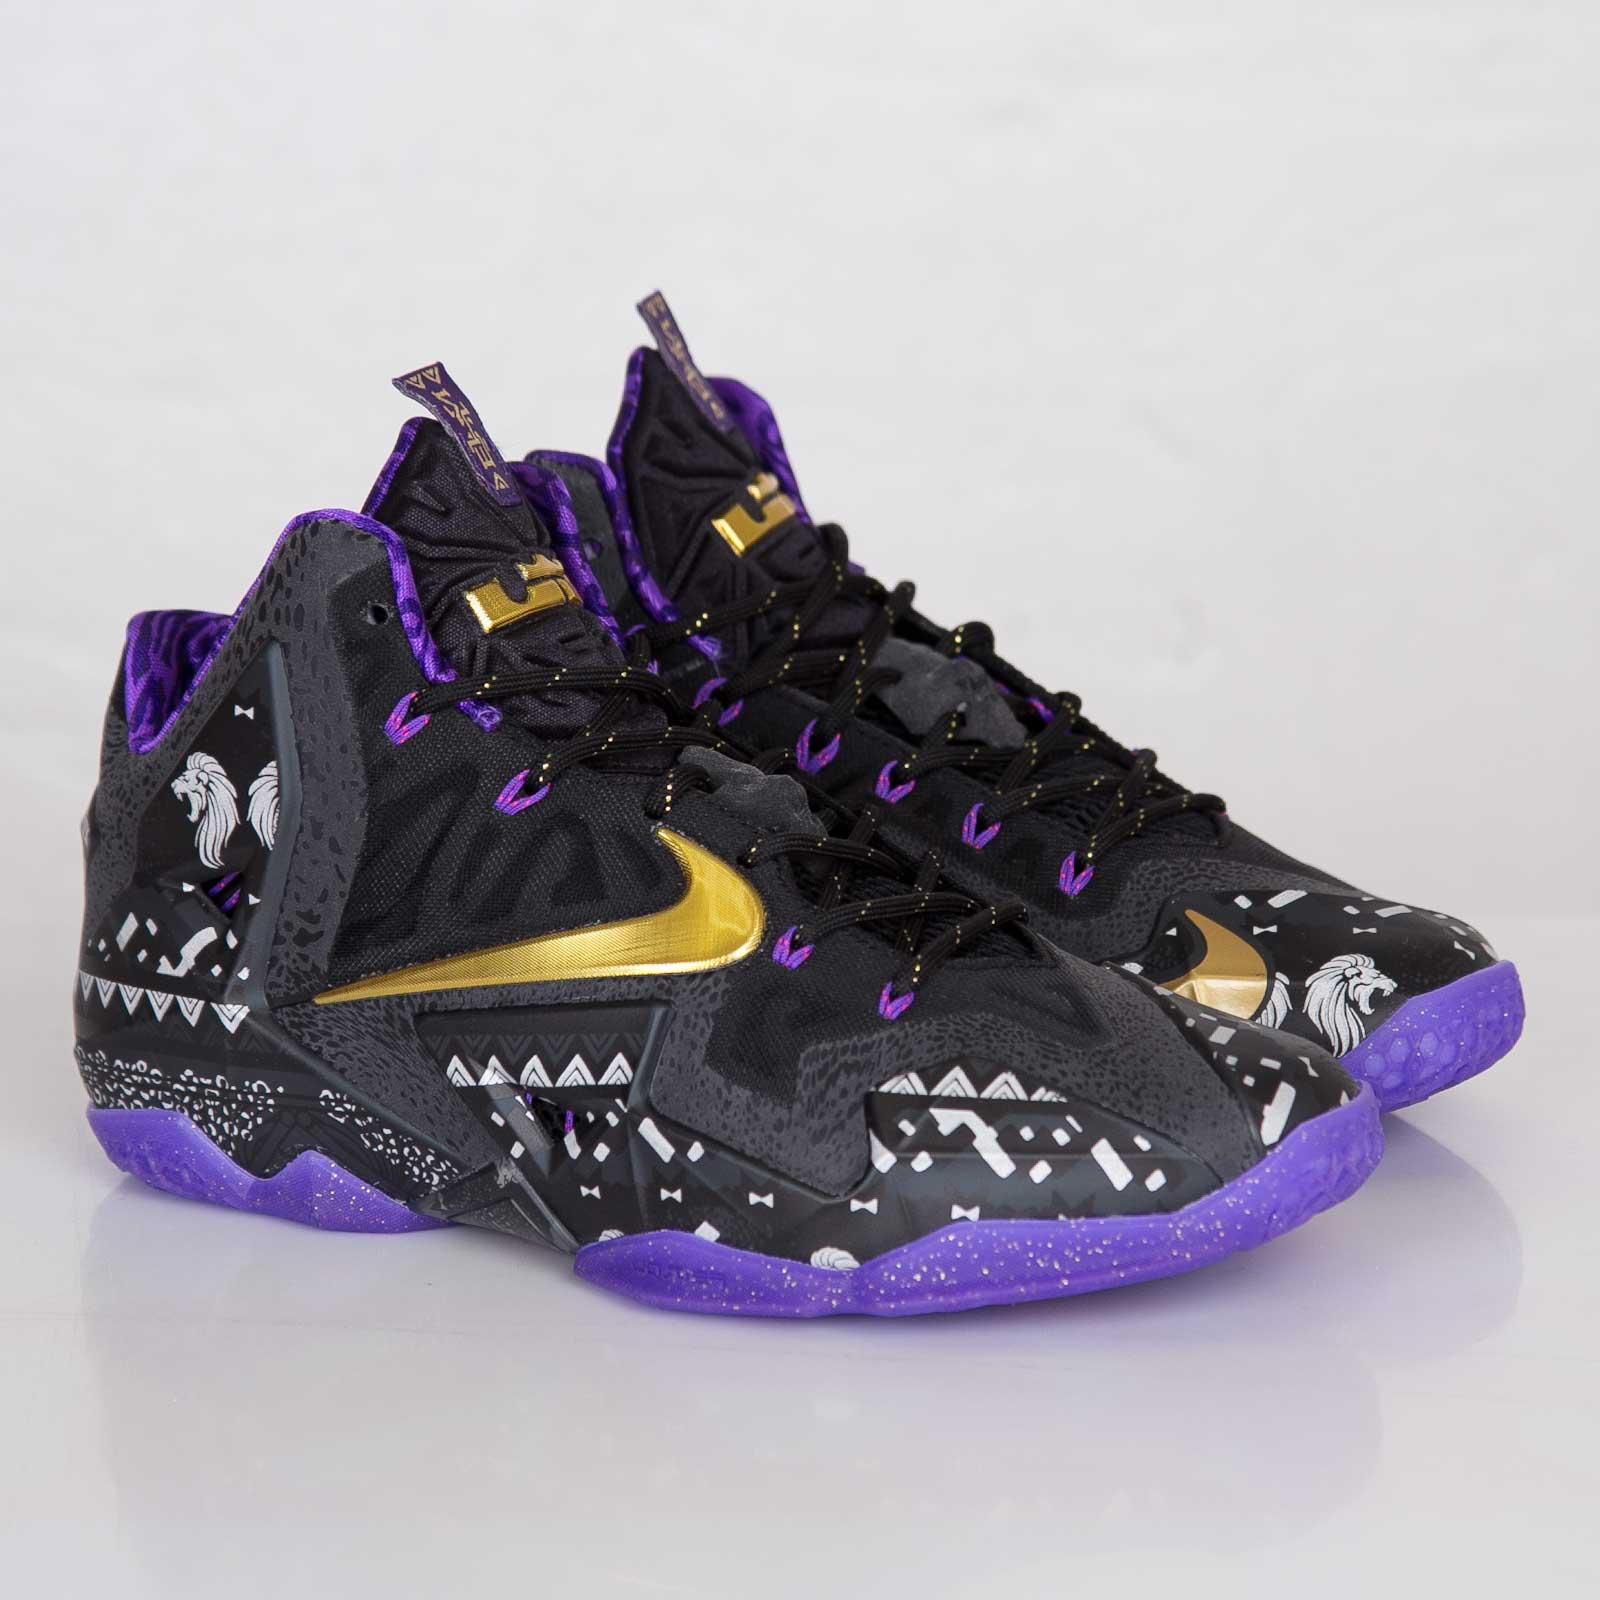 88a9f320b90 Nike Lebron Xl BHM - 646702-001 - Sneakersnstuff